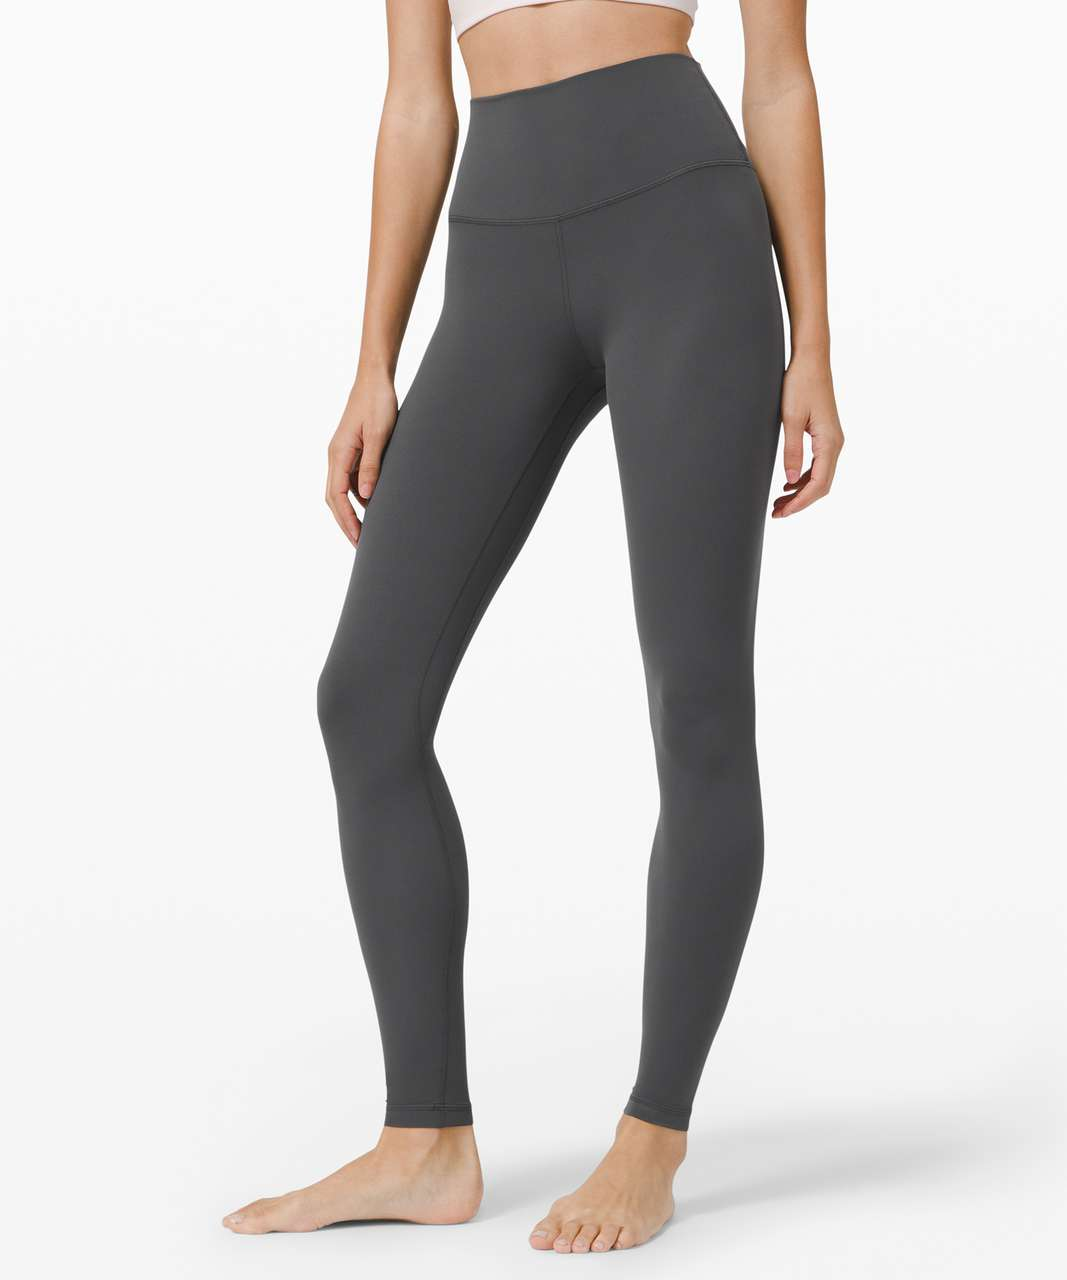 "Lululemon Align Pant 31"" - Graphite Grey"